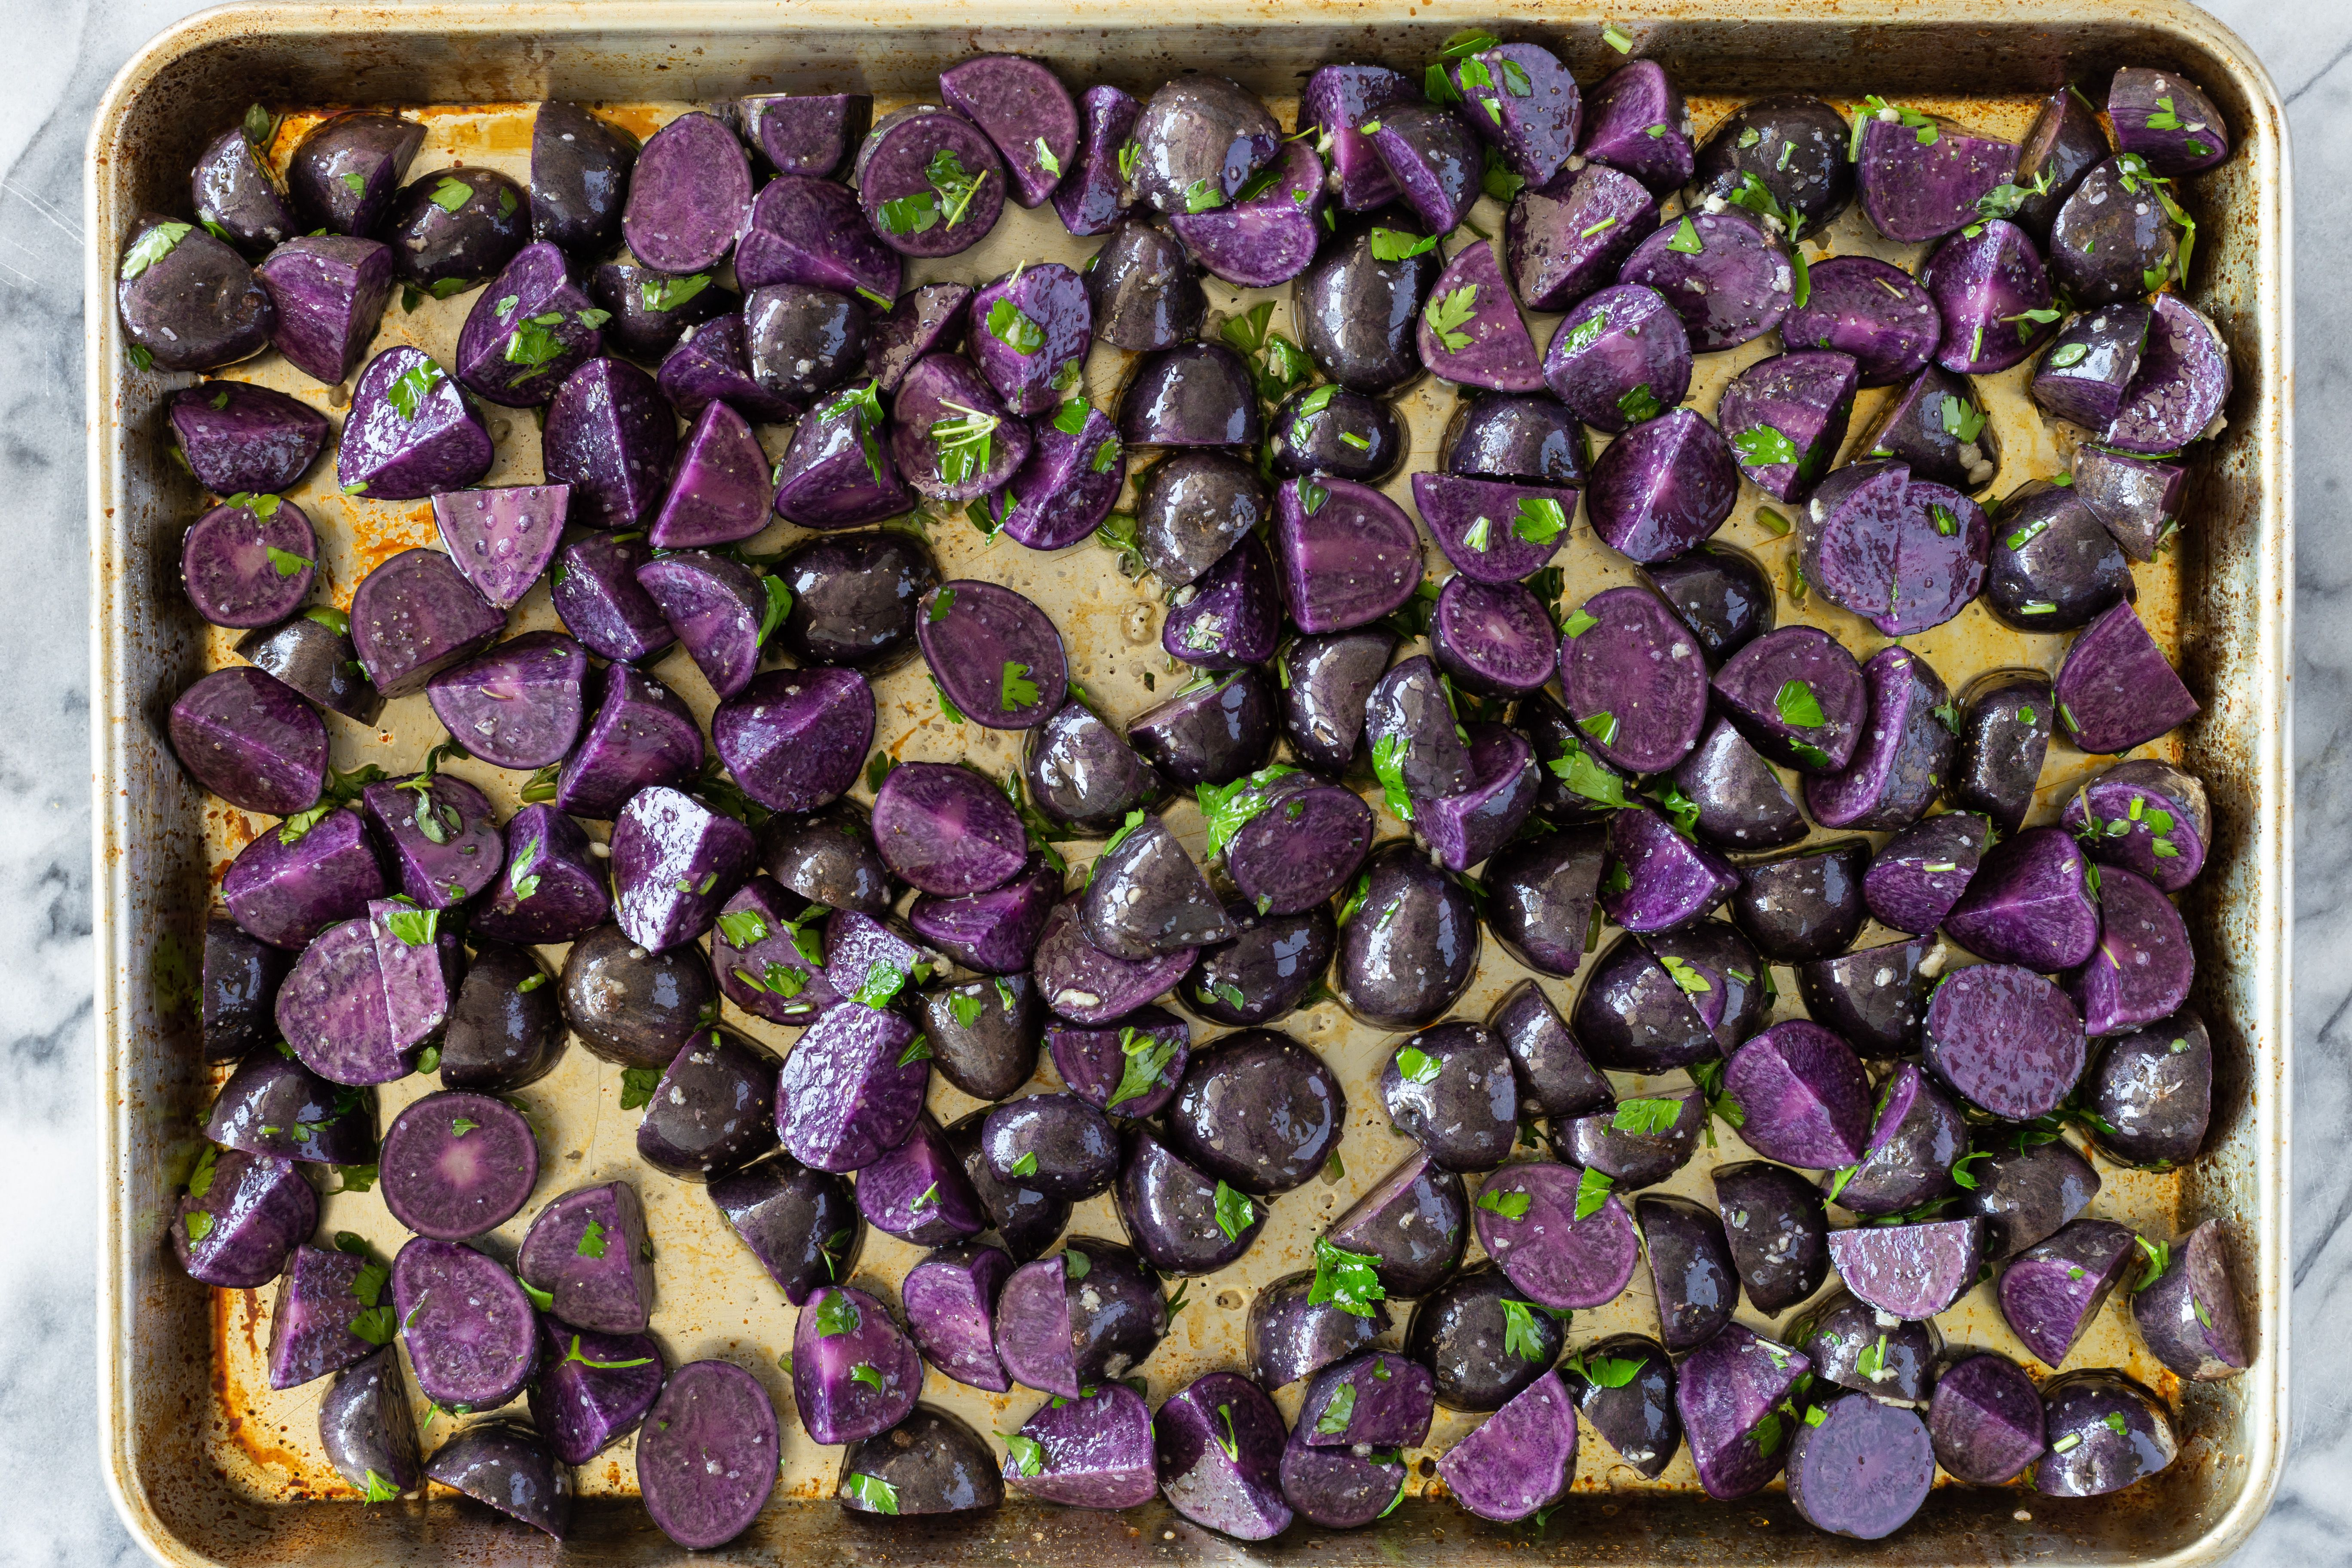 Purple potatoes on baking sheet